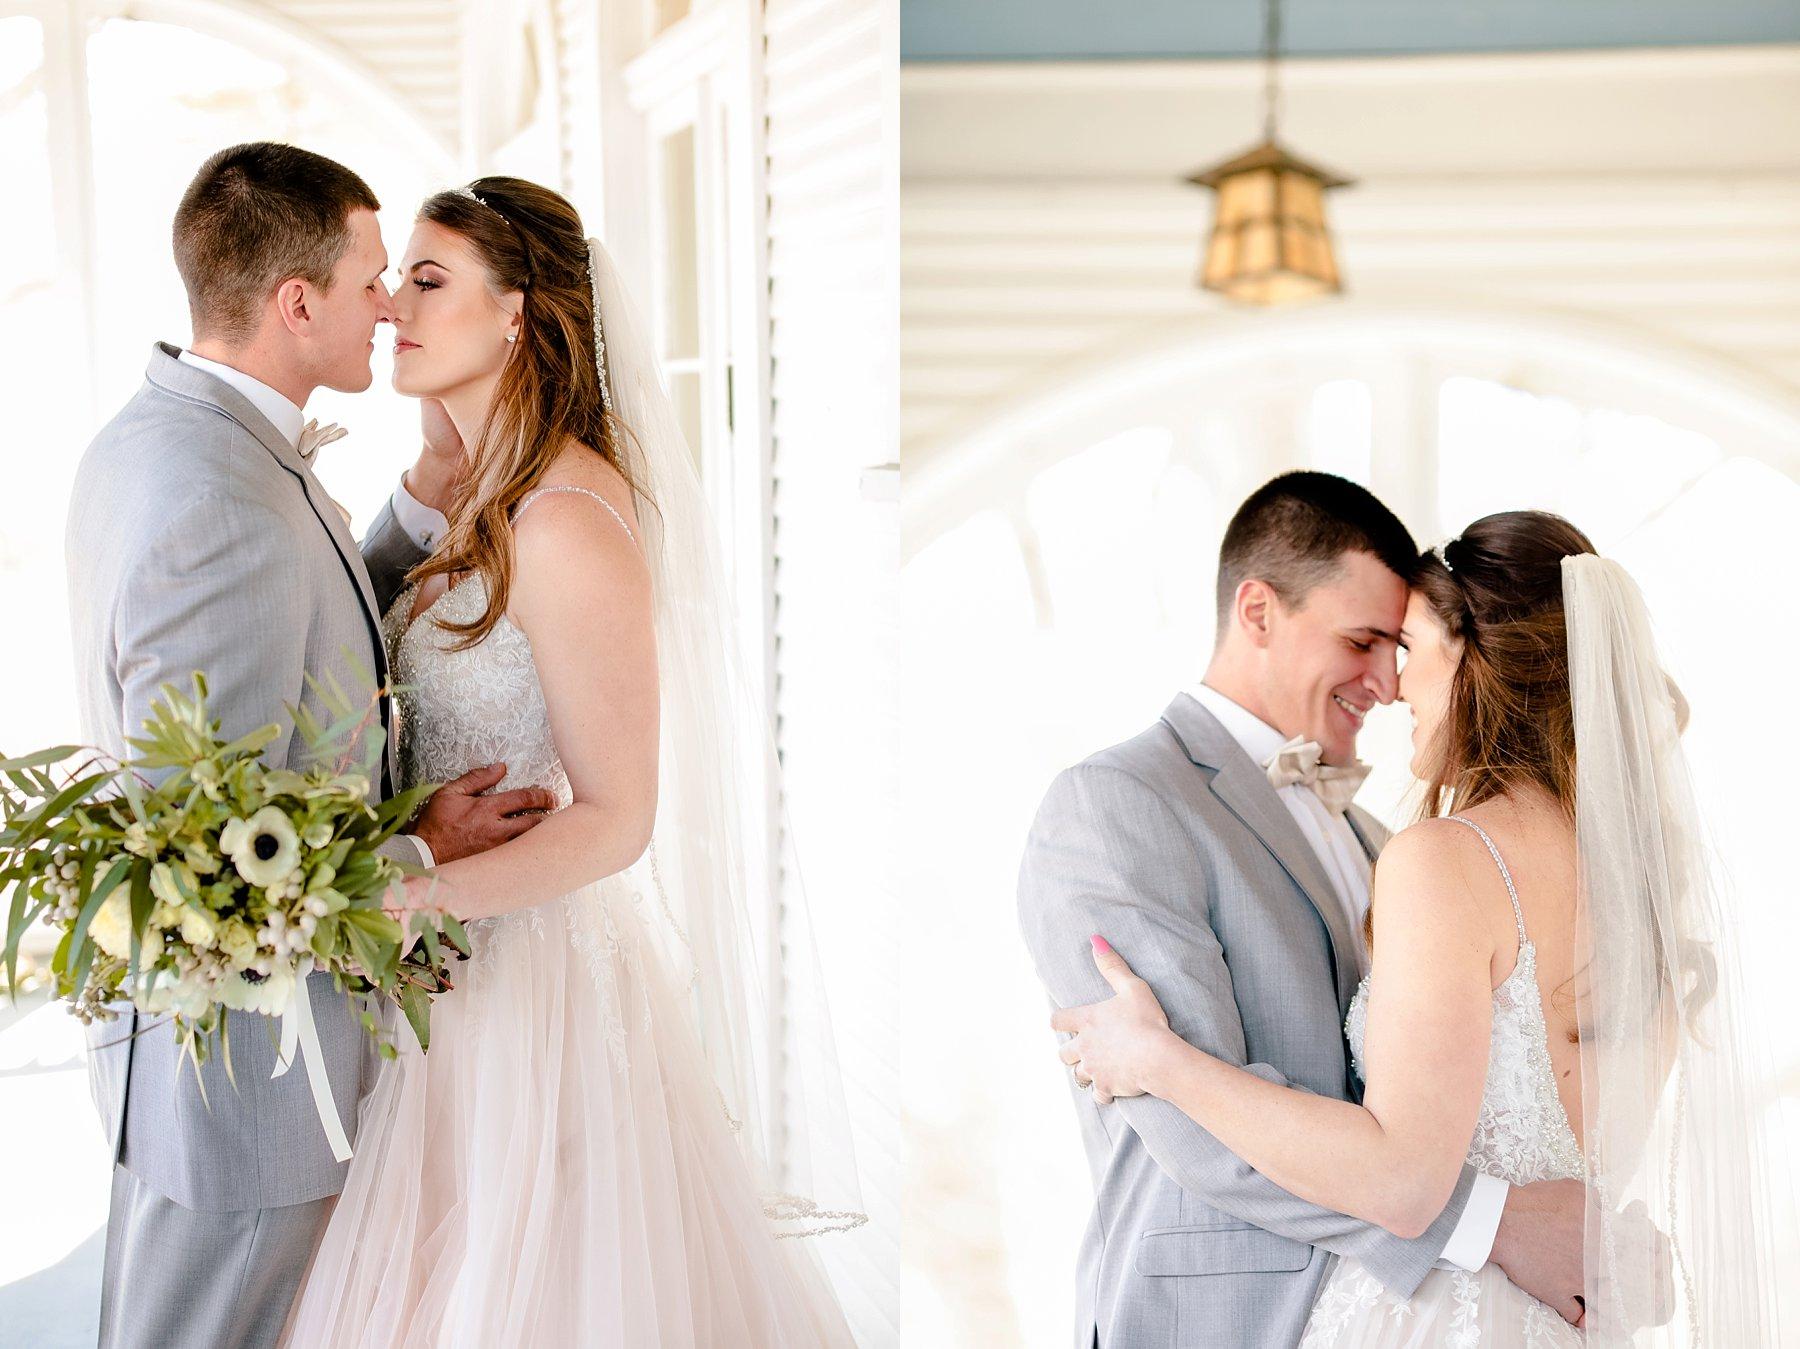 photographer_wedding_saint_louis_Kansas_City_Photography_Videography_workshop_training_styled_engagement_Lake_Ozark_KC_MO_STL_Rolla_Hermann_Saint_James_0413.jpg